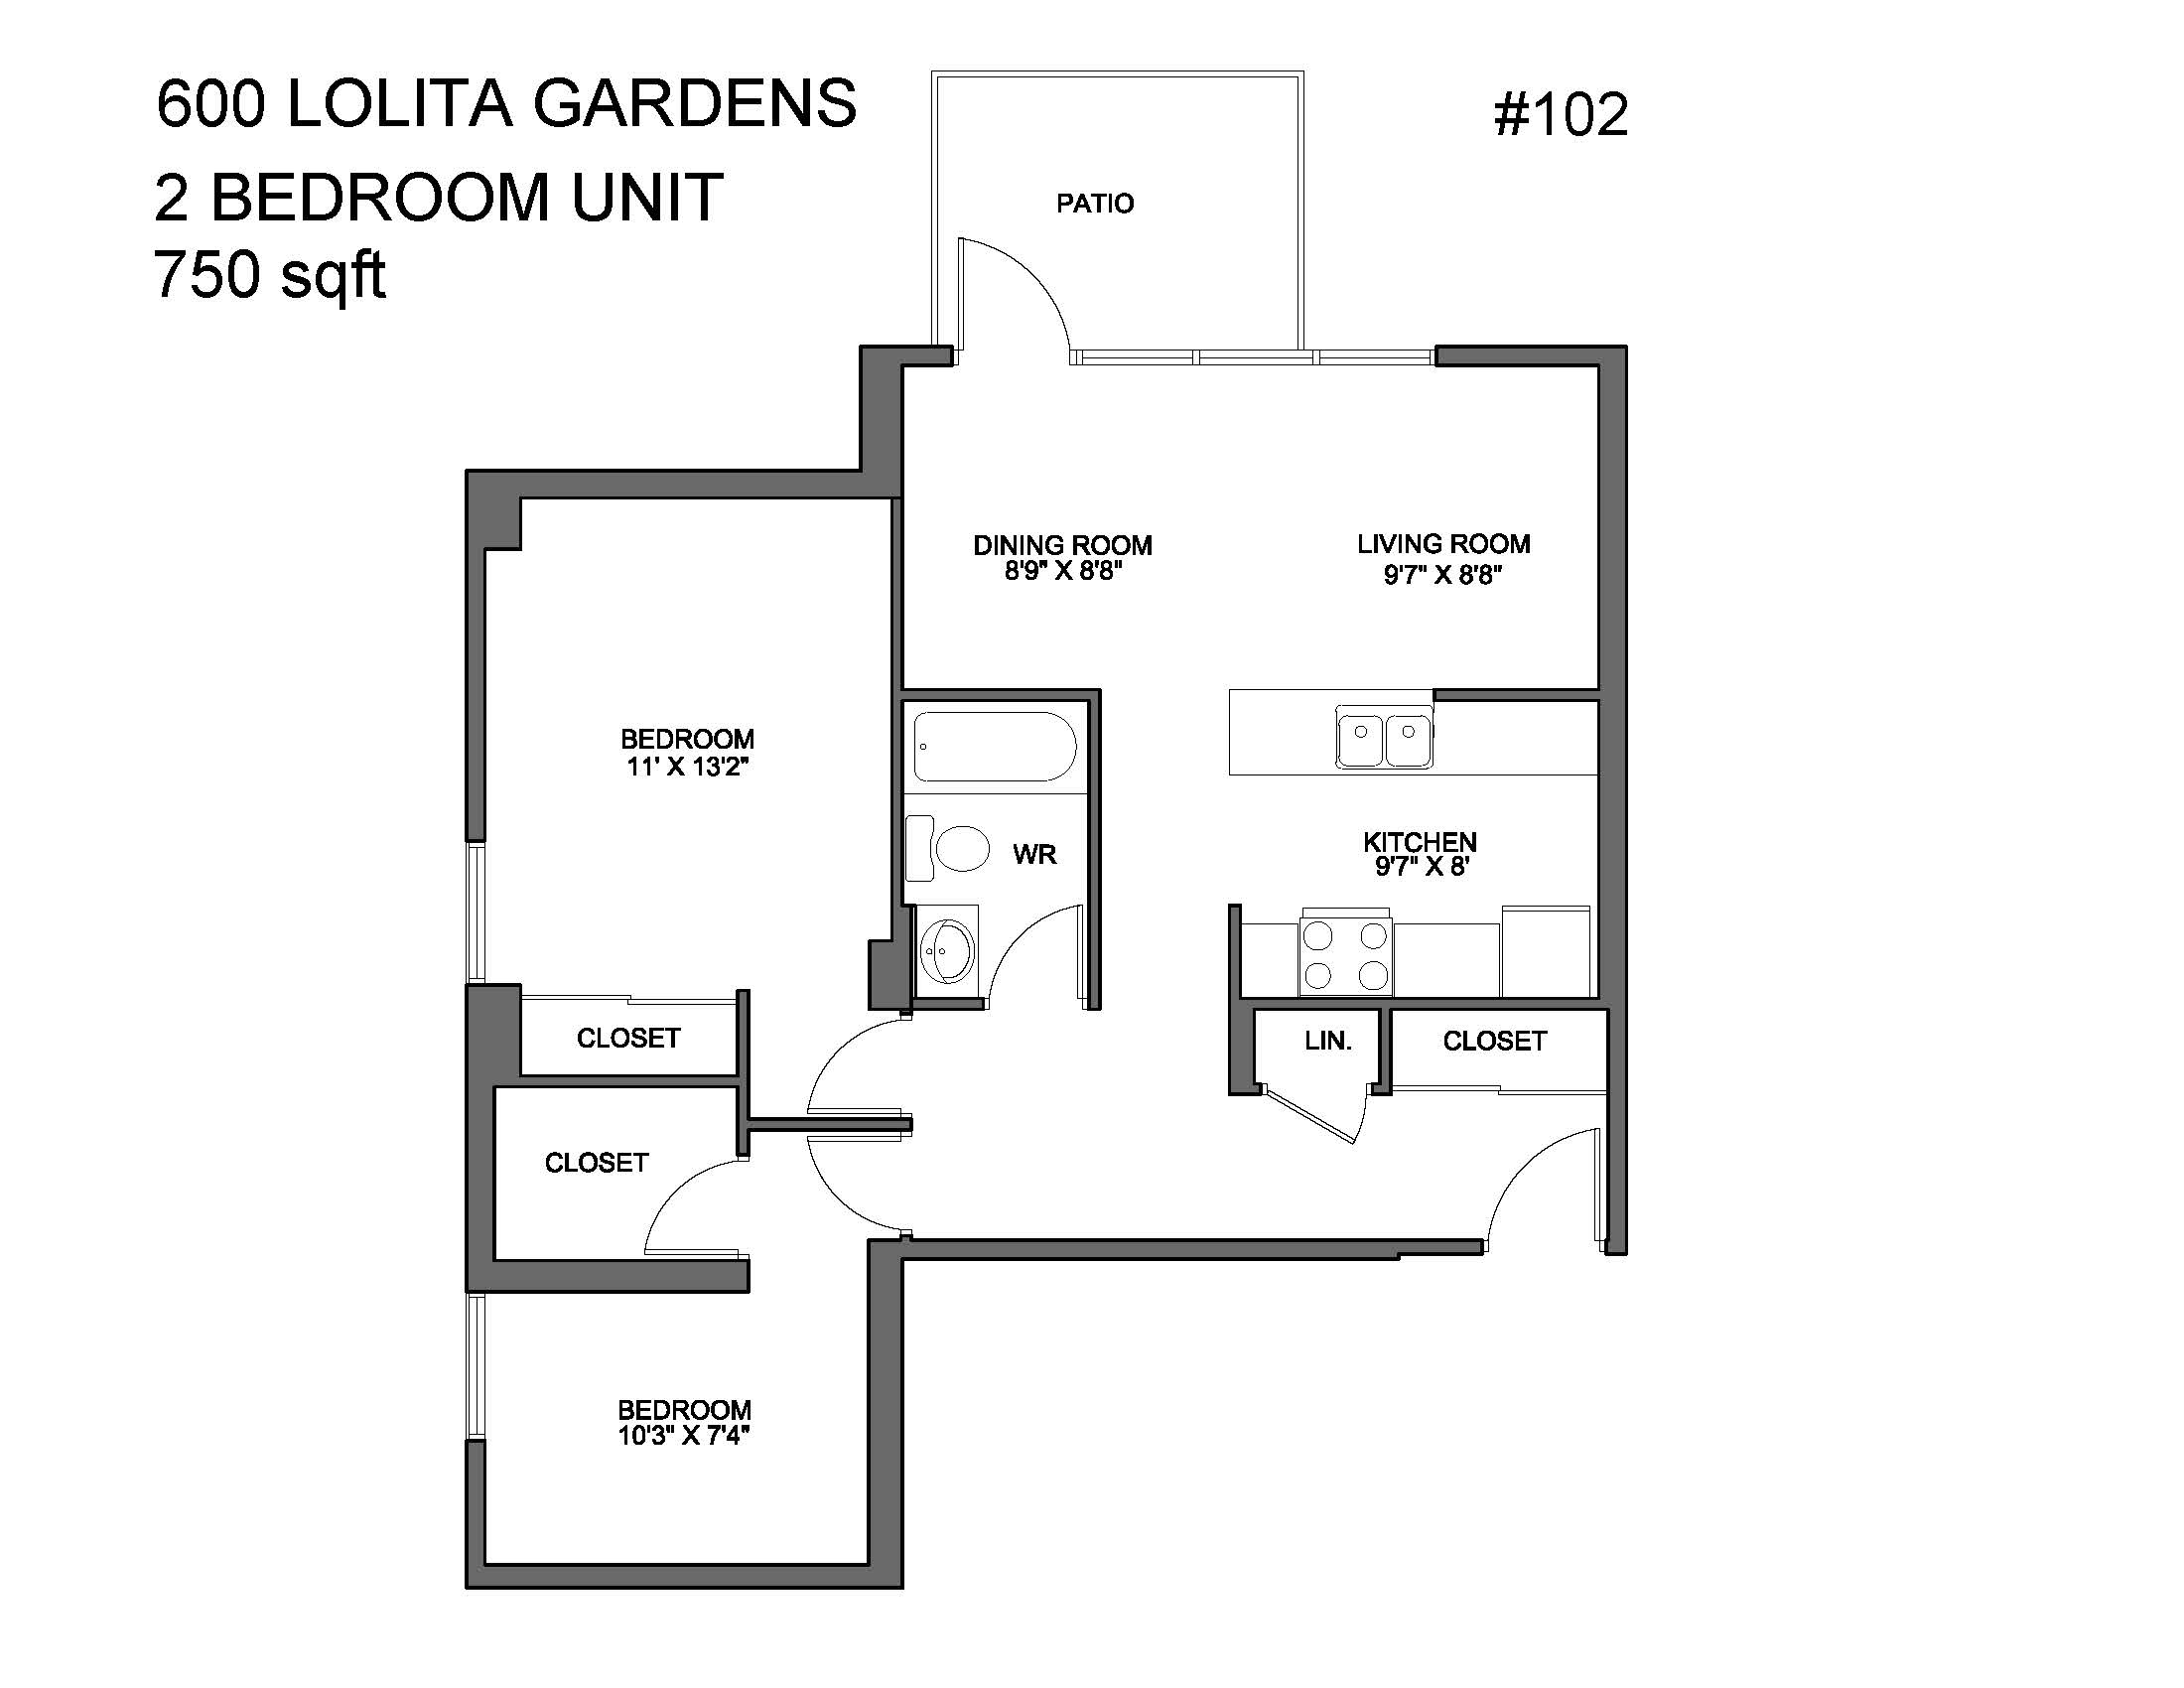 600 & 620 Lolita Gardens | Park Property Management